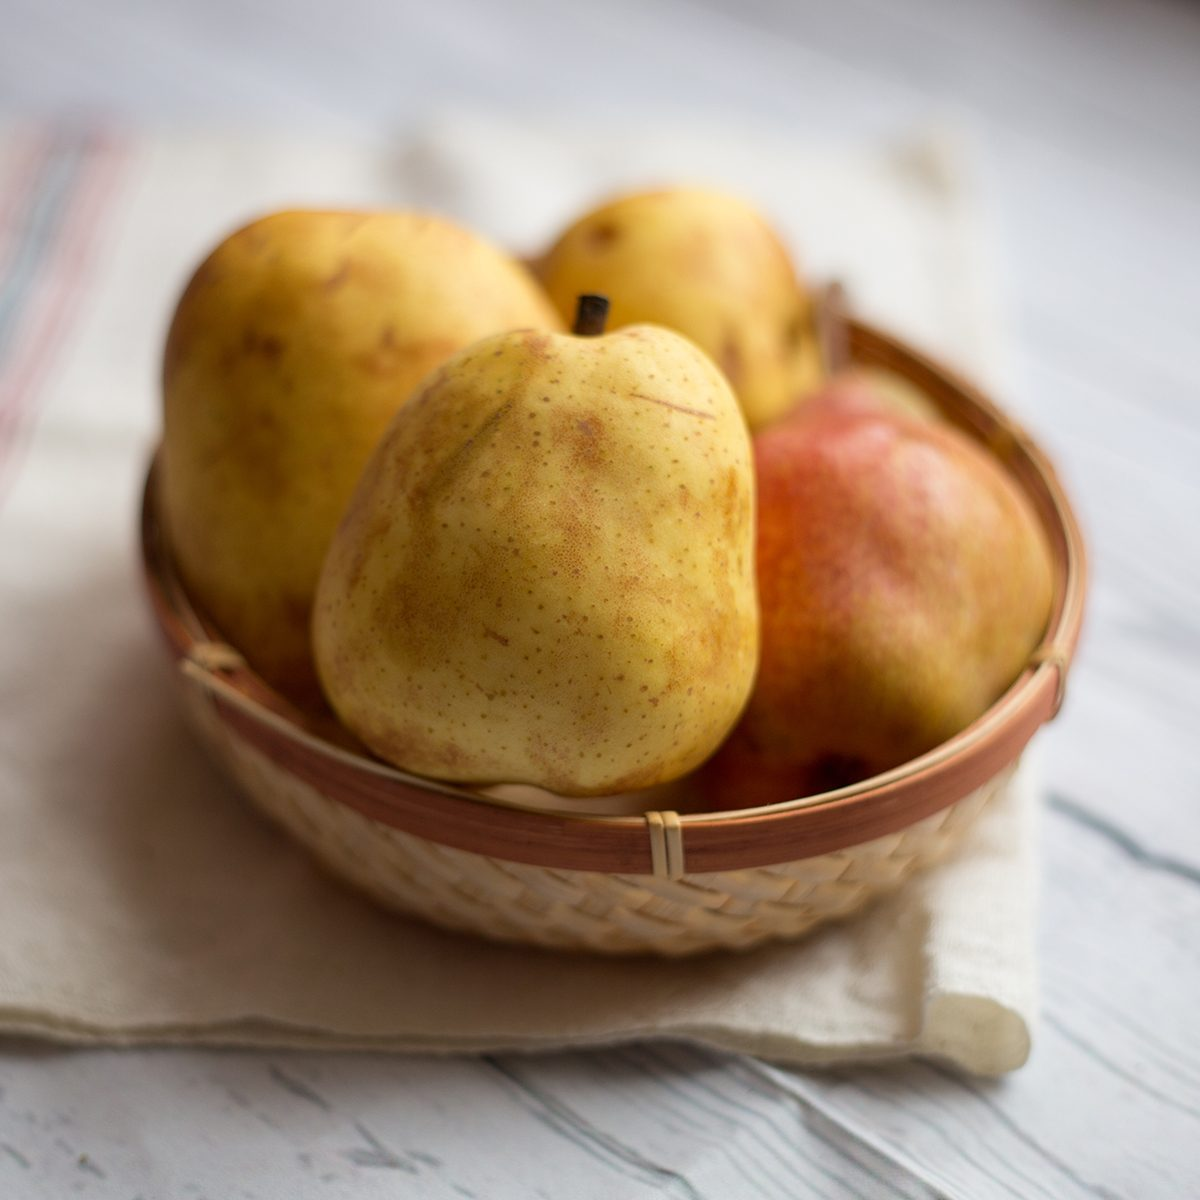 Fruit background. Fresh organic pears on old wood.